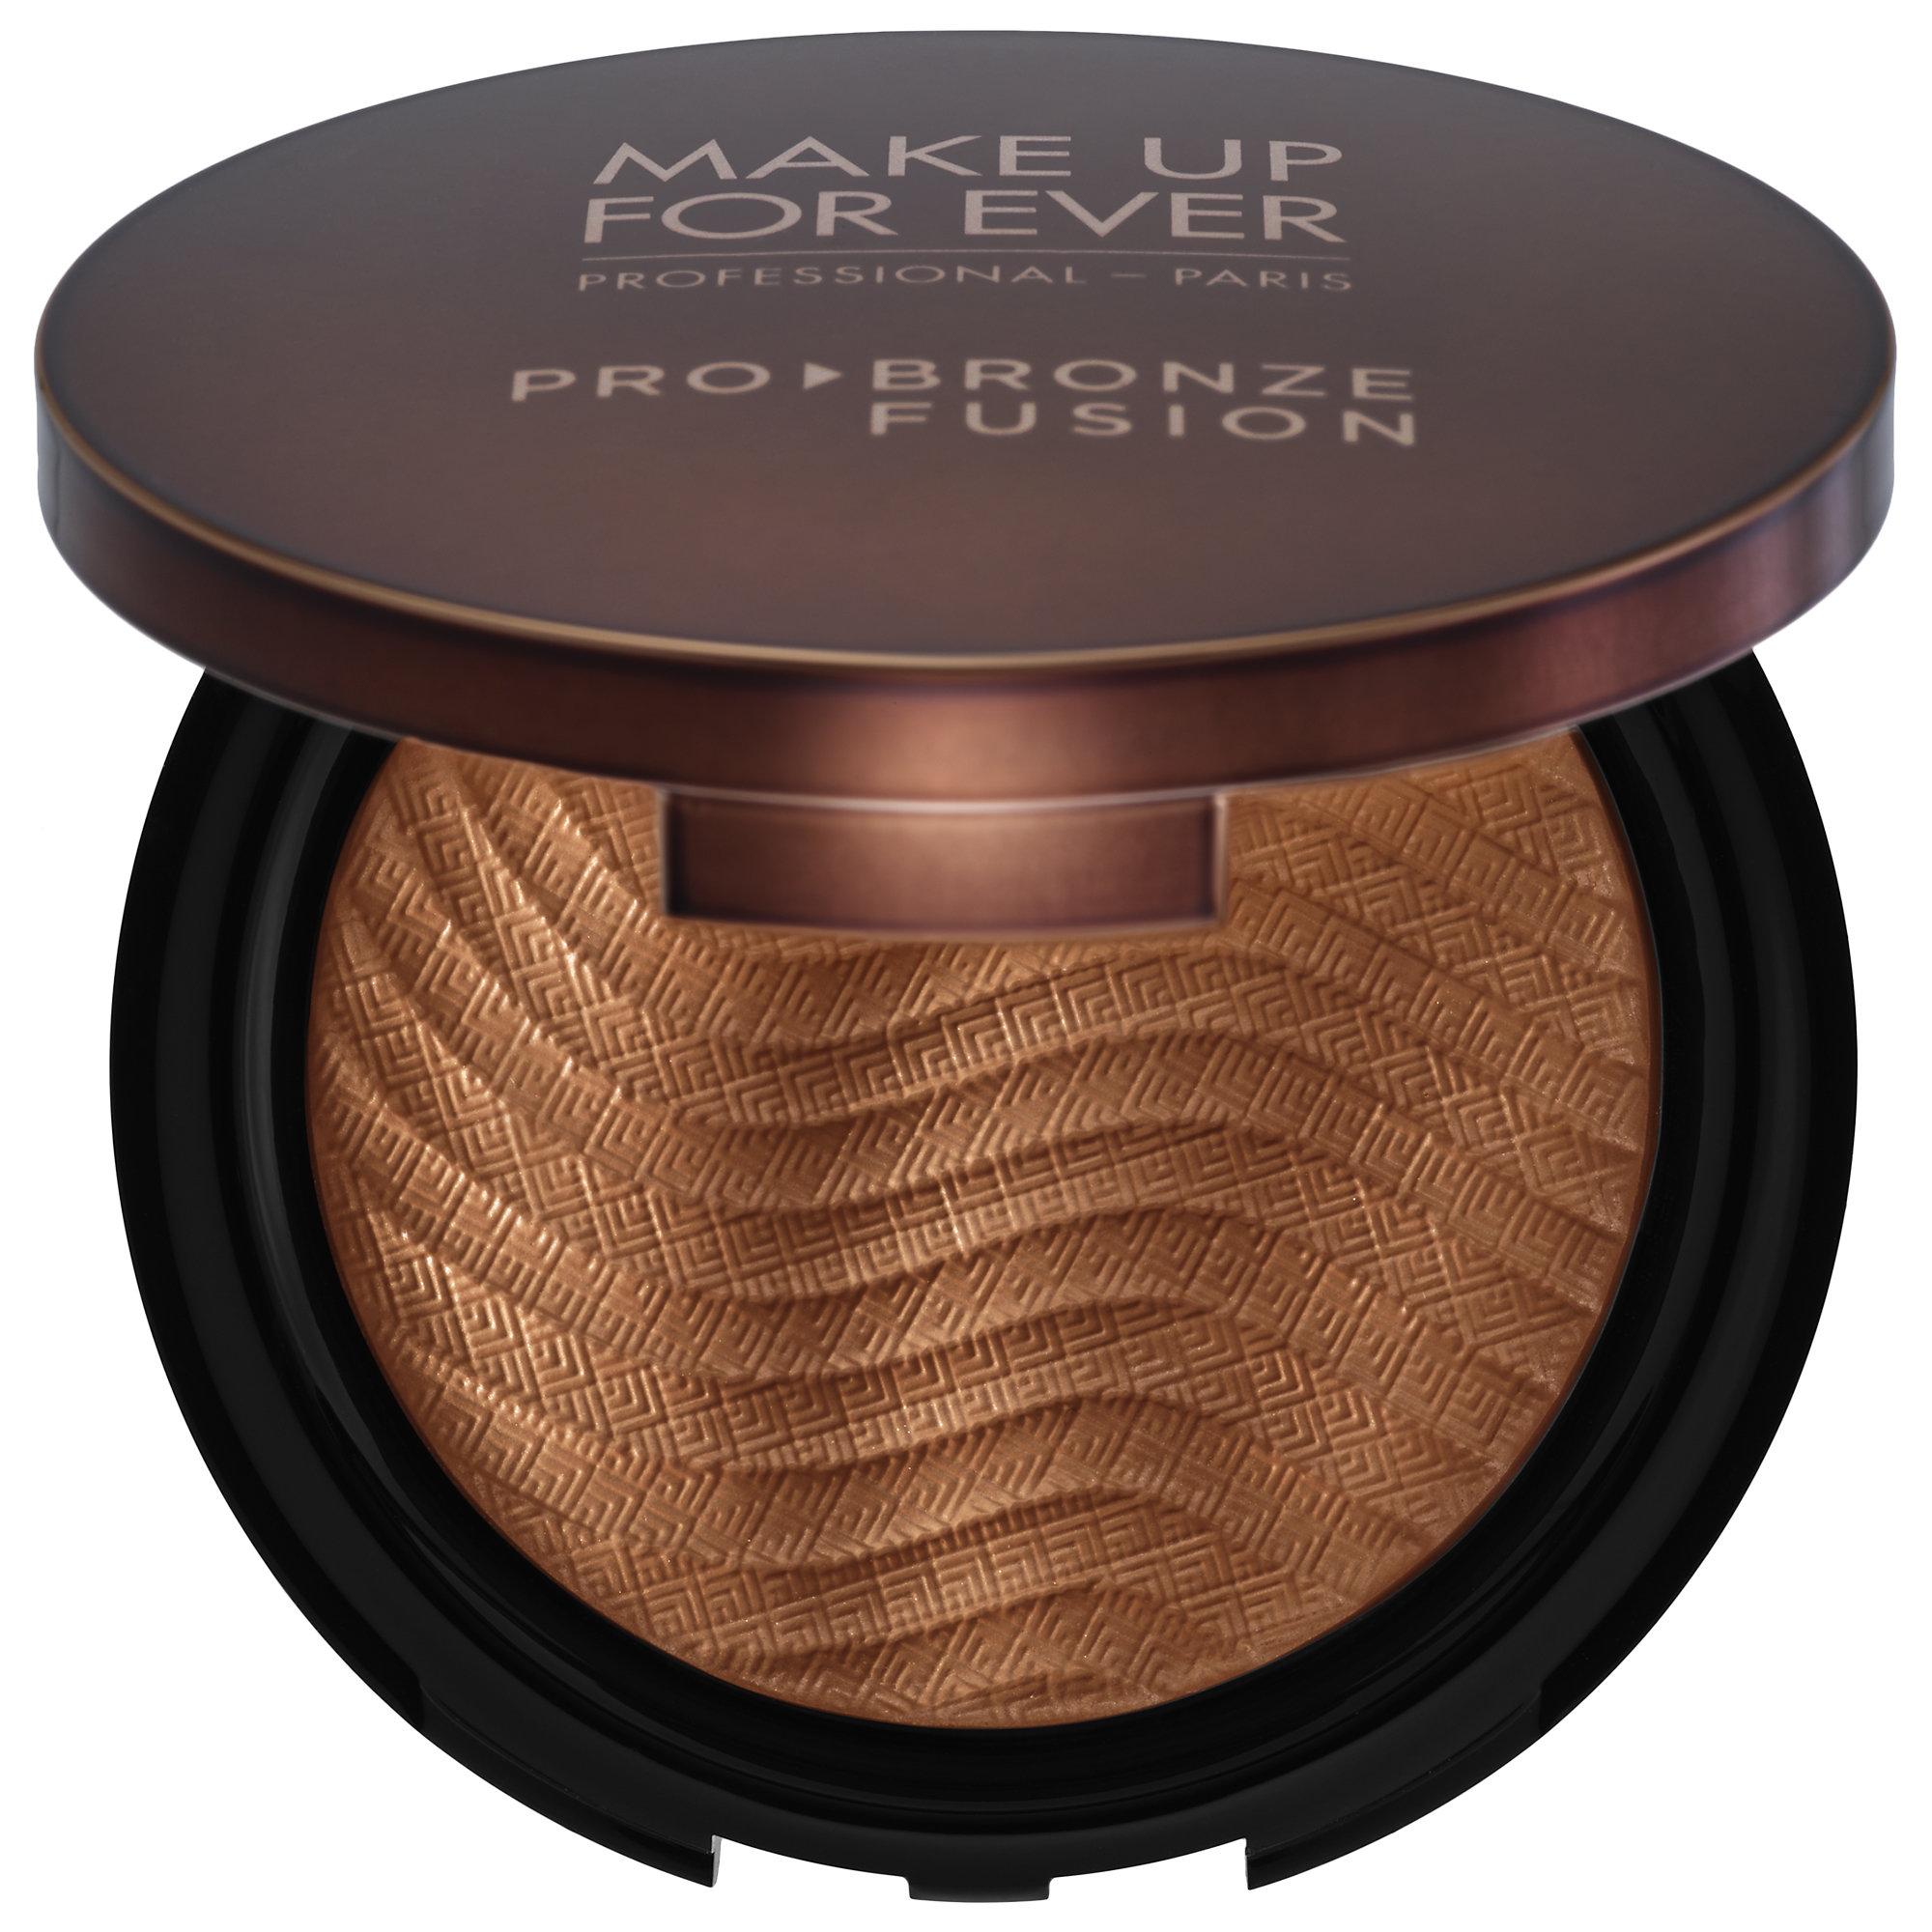 Make Up For Ever Pro Bronze Fusion 35i Caramel